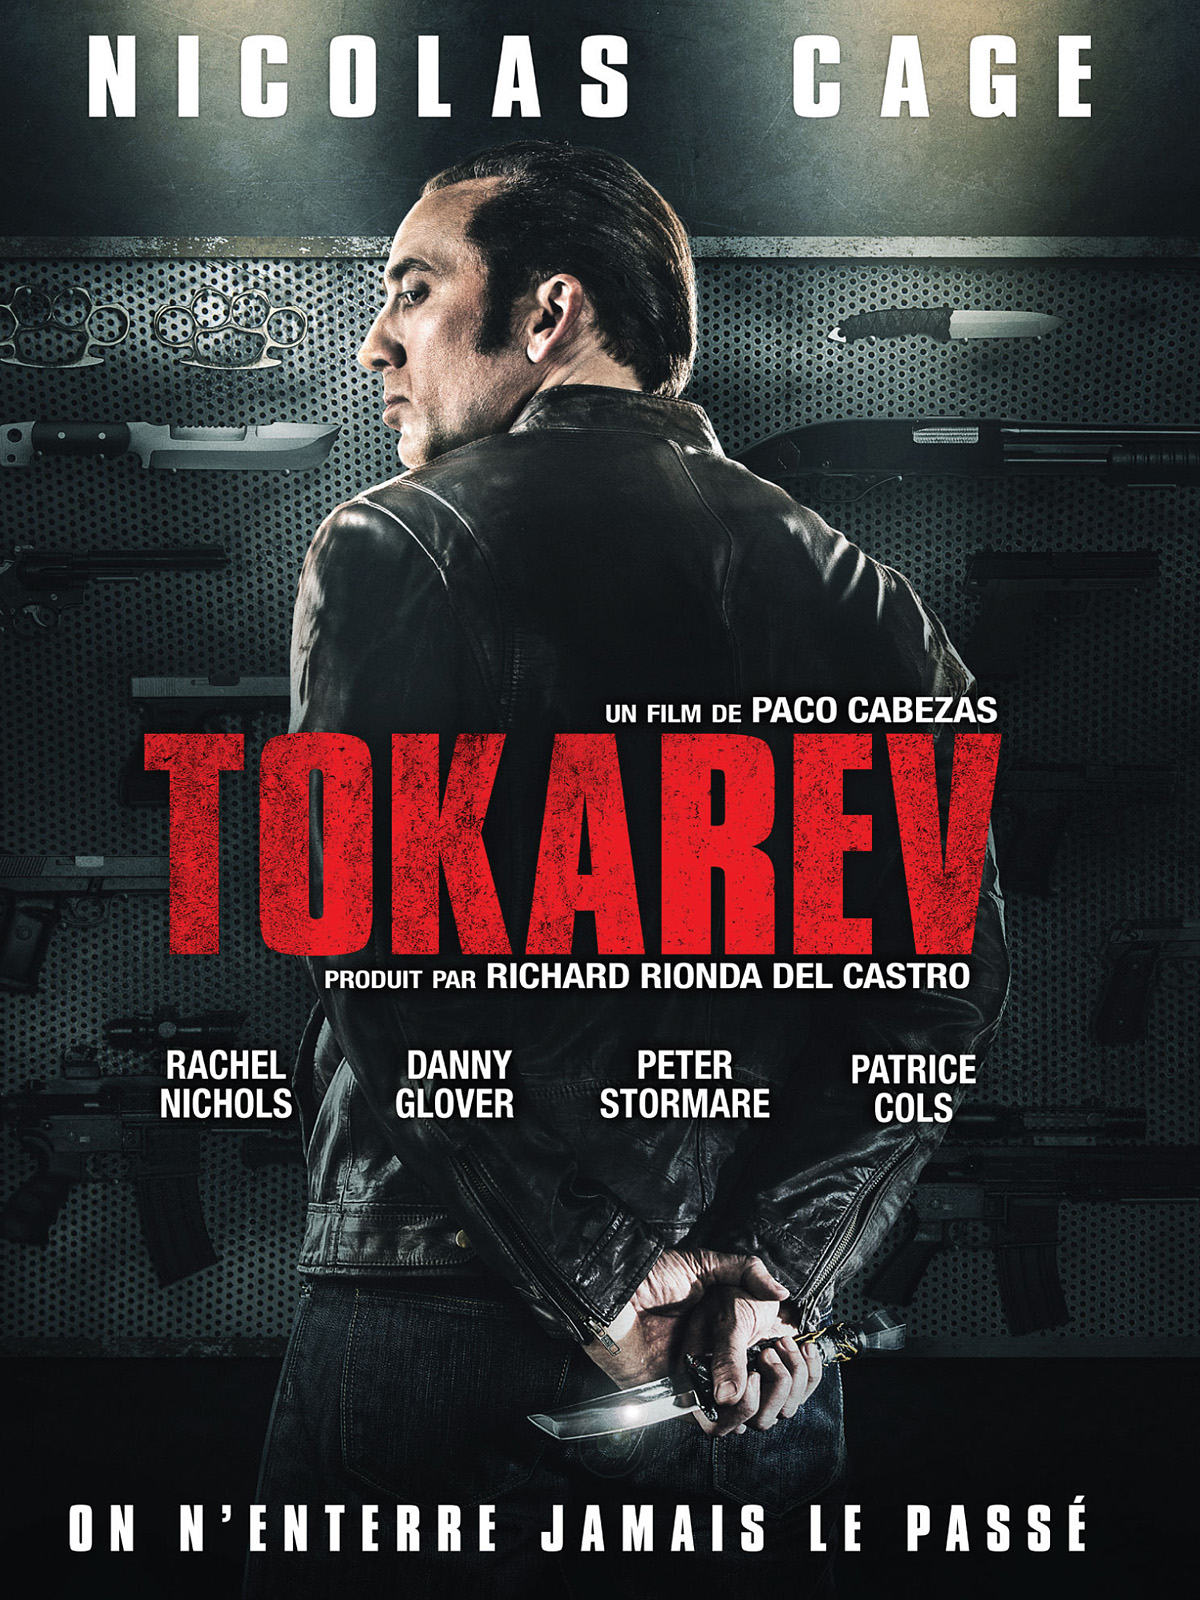 Tokarev film 2014 AlloCin